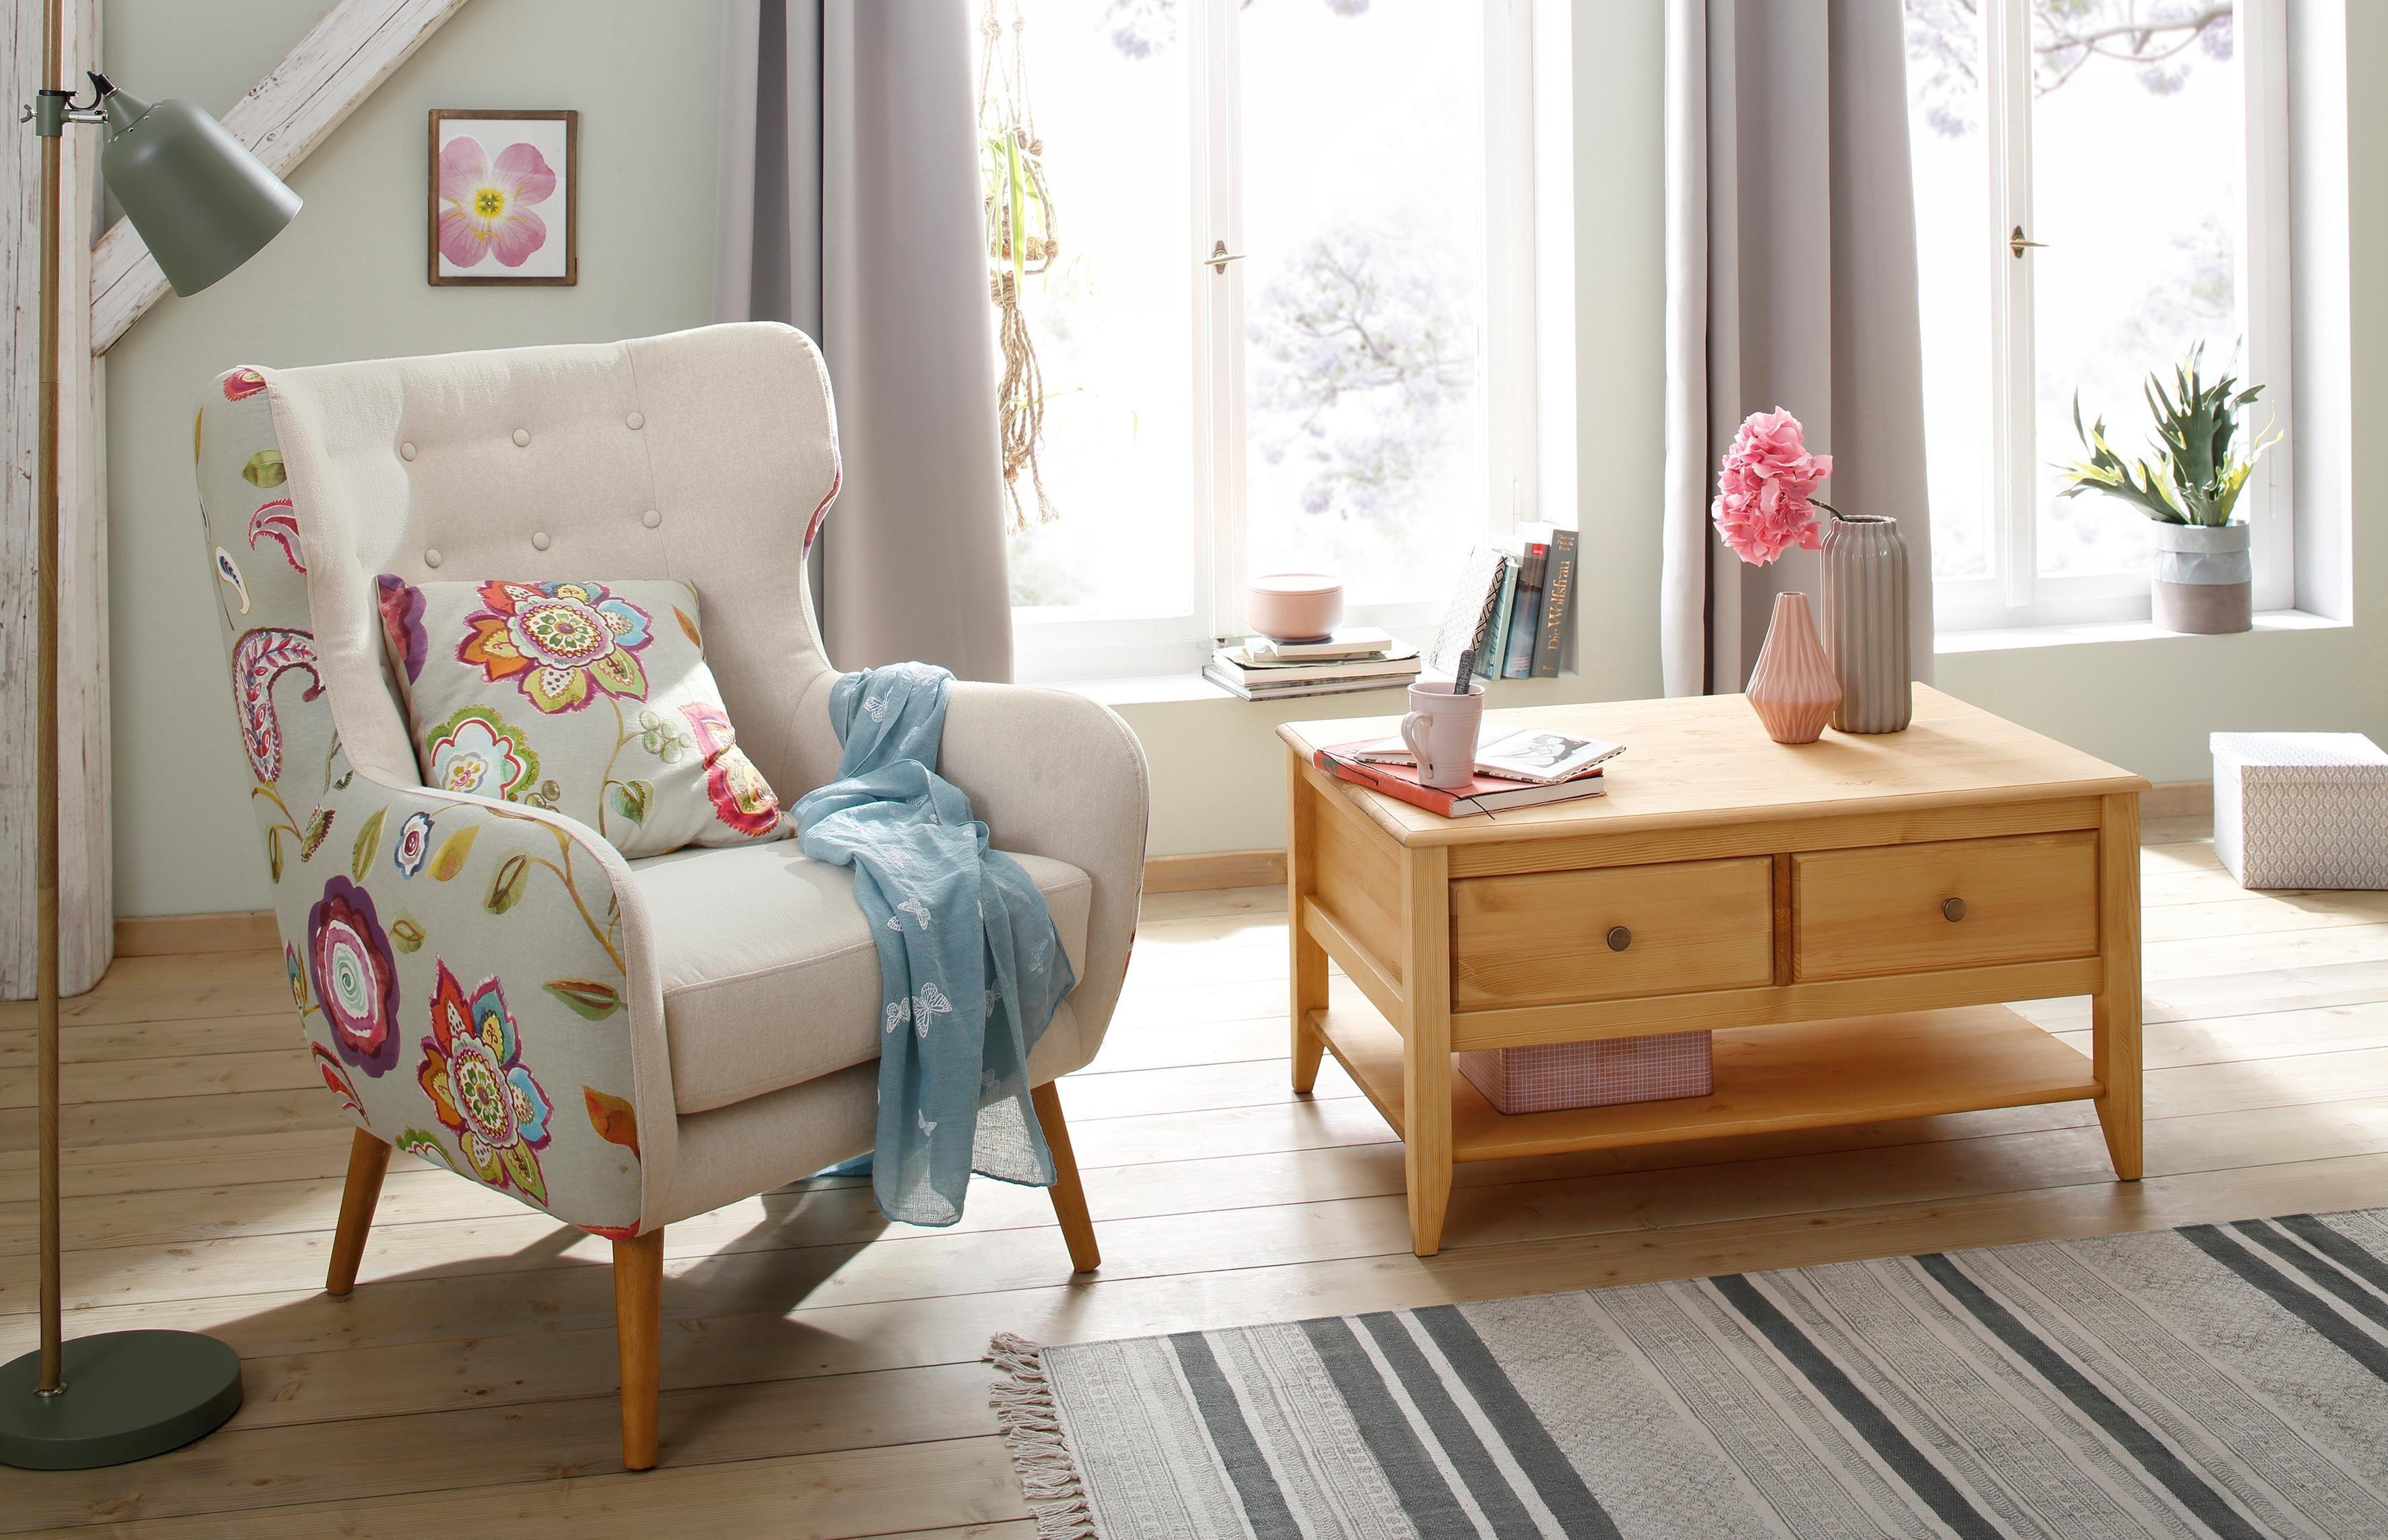 50 sparen home affaire ohrensessel missouri nur 289 99 cherry m bel otto. Black Bedroom Furniture Sets. Home Design Ideas